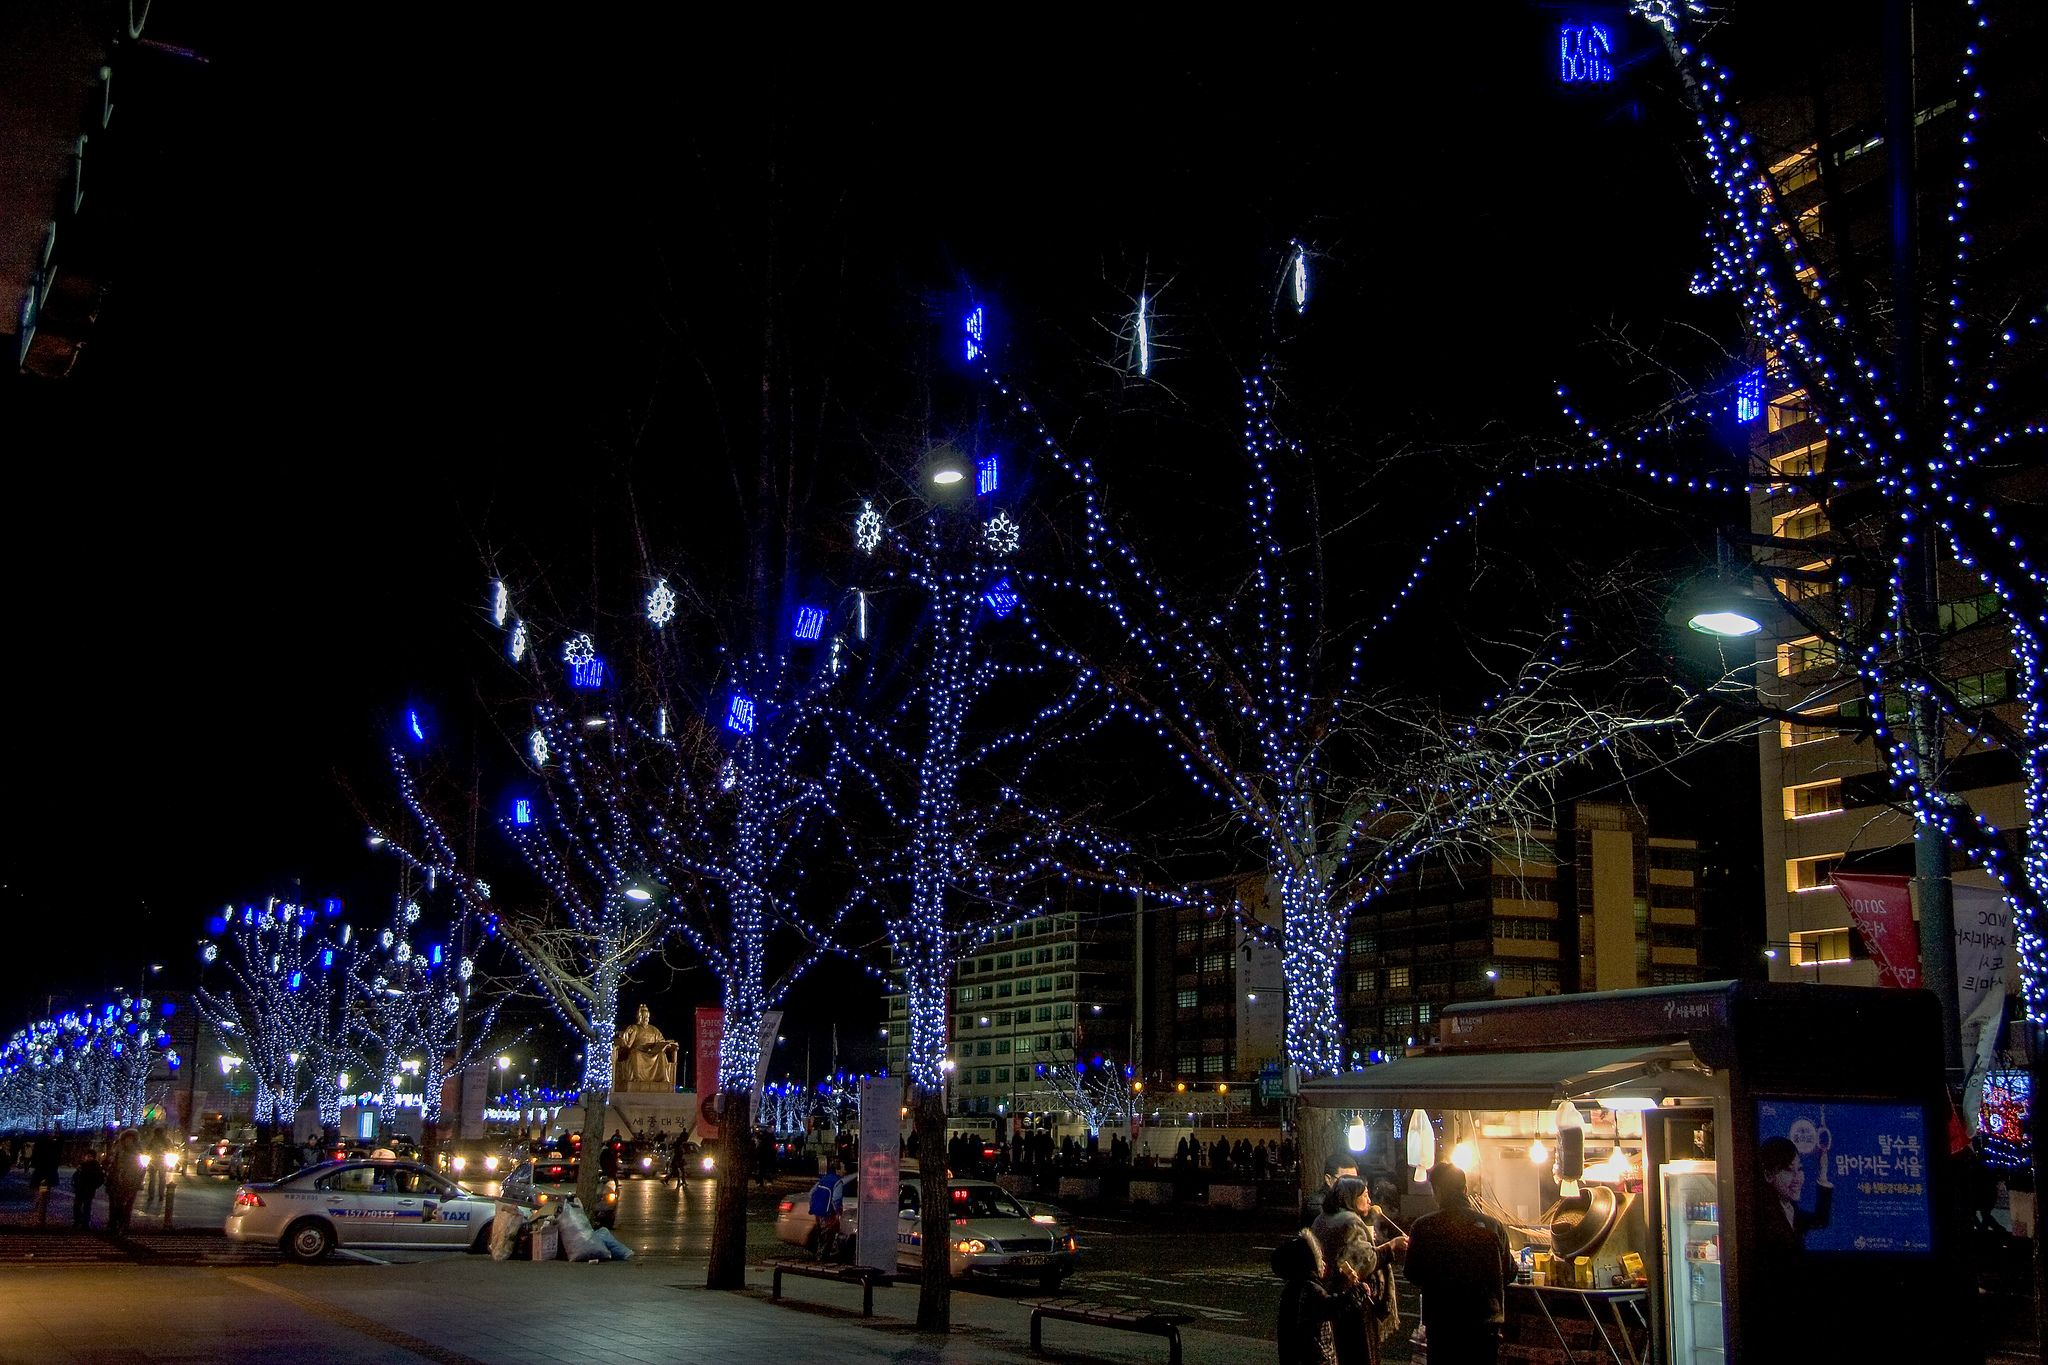 https://flic.kr/p/qHfjNy | 서울광장 : Seoul Plaza | 서울광장이 겨울밤은 예쁘다.